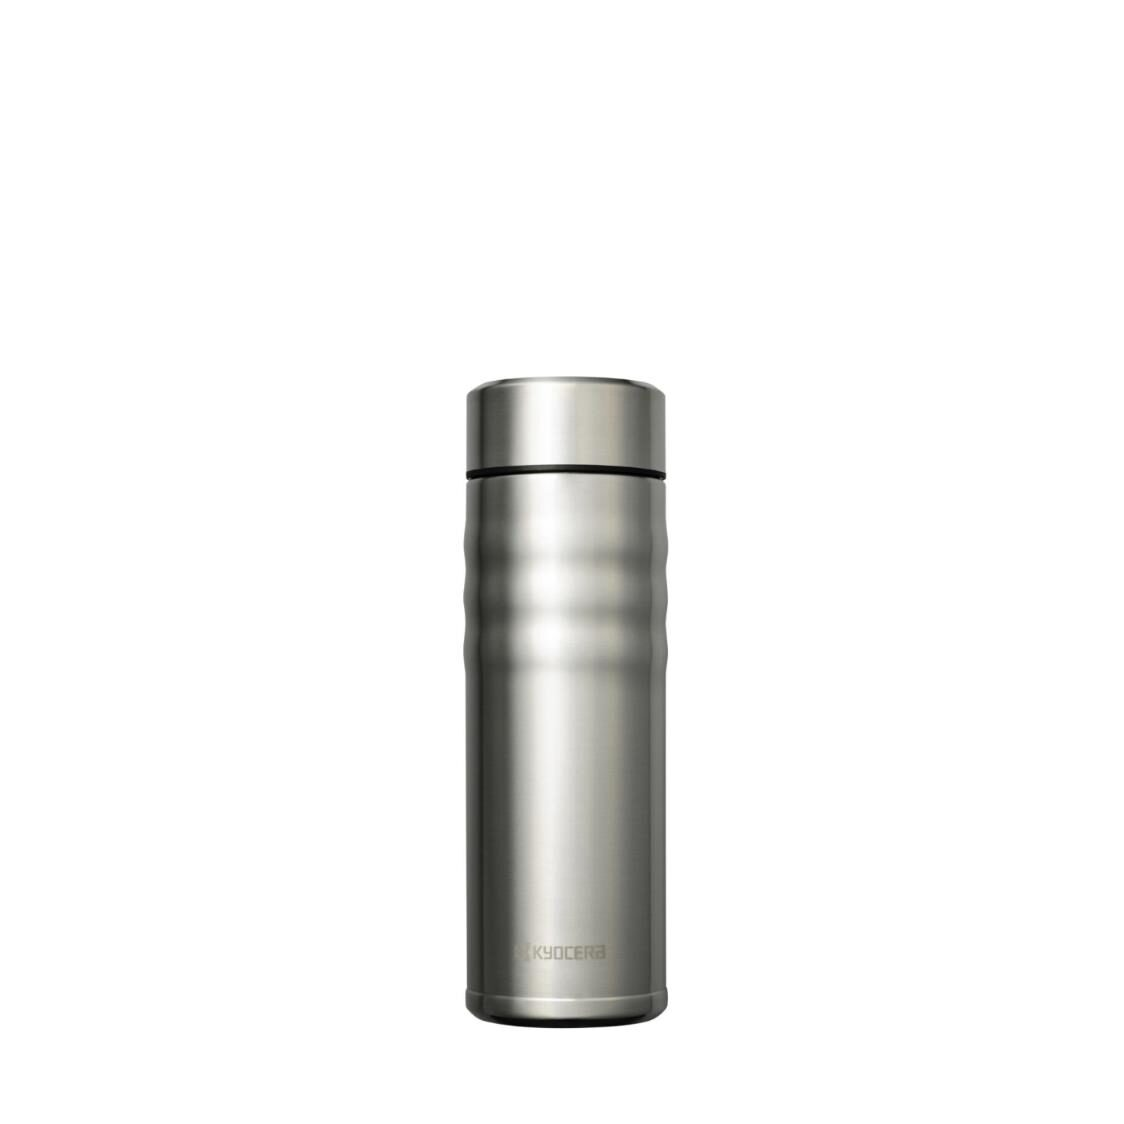 Kyocera Advanced Ceramic 500ml Cerabrid Mug - Silver MB-17S SS